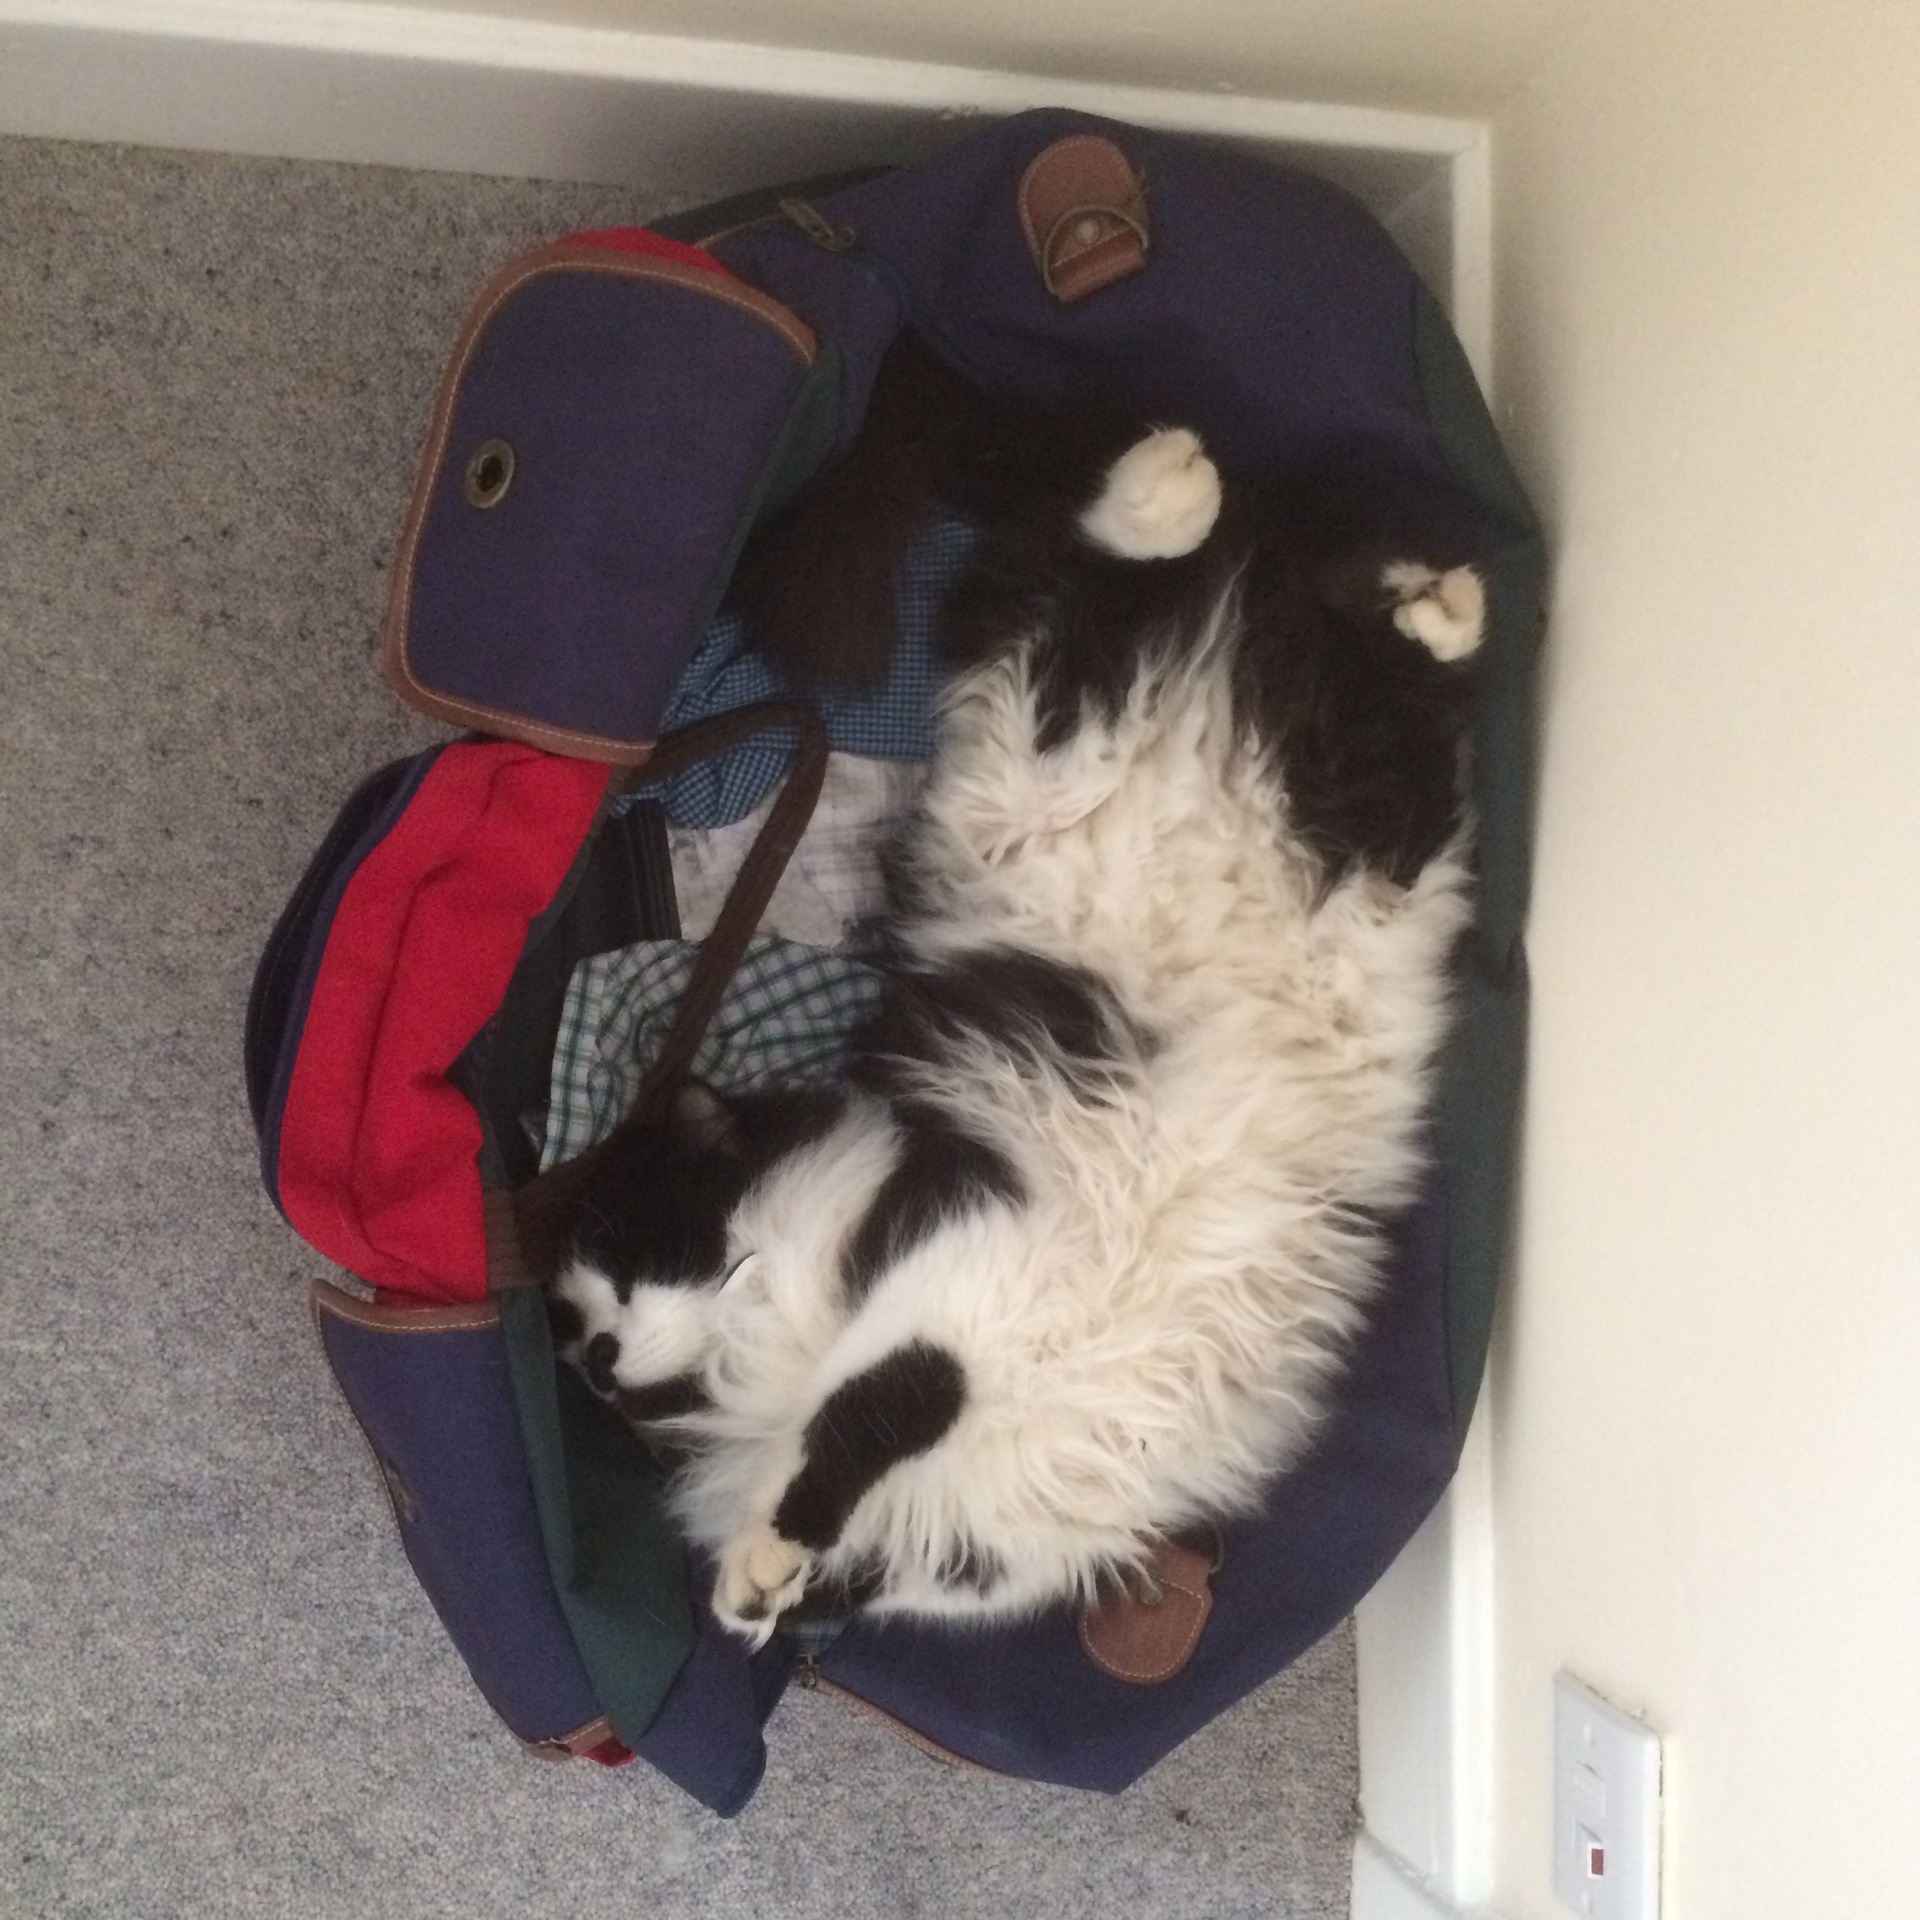 Felis silvestris (domestic cat) 'Mr Mittens' – Feb 2016